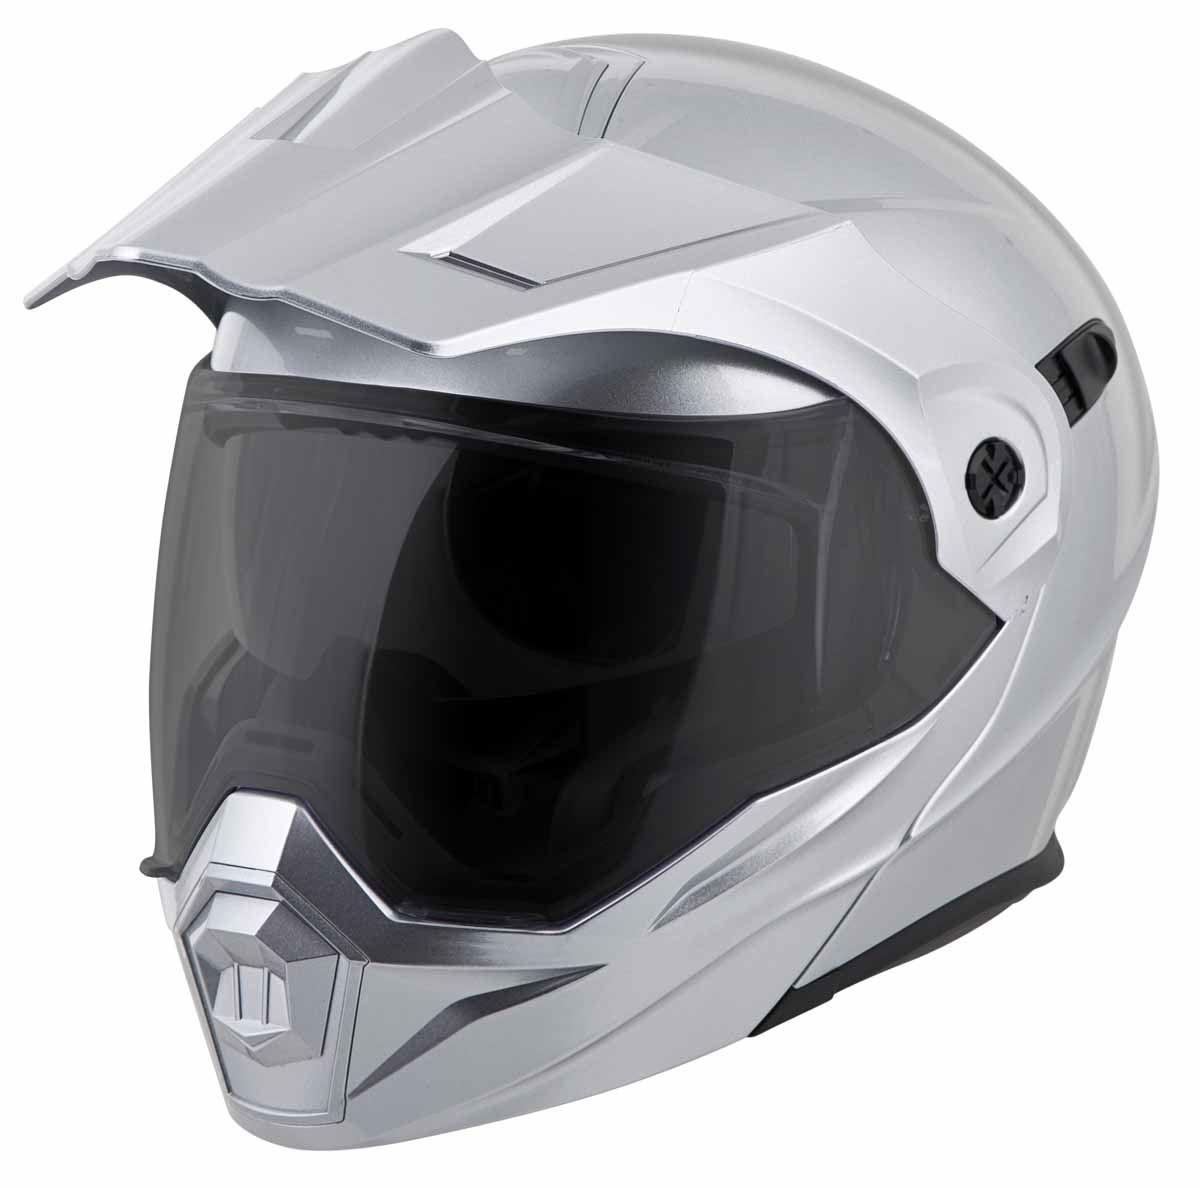 Scorpion-EXO-AT950-Helmet-Flip-Up-Modular-Dual-Sport-Adventure-ADV-DOT-XS-3XL miniature 16